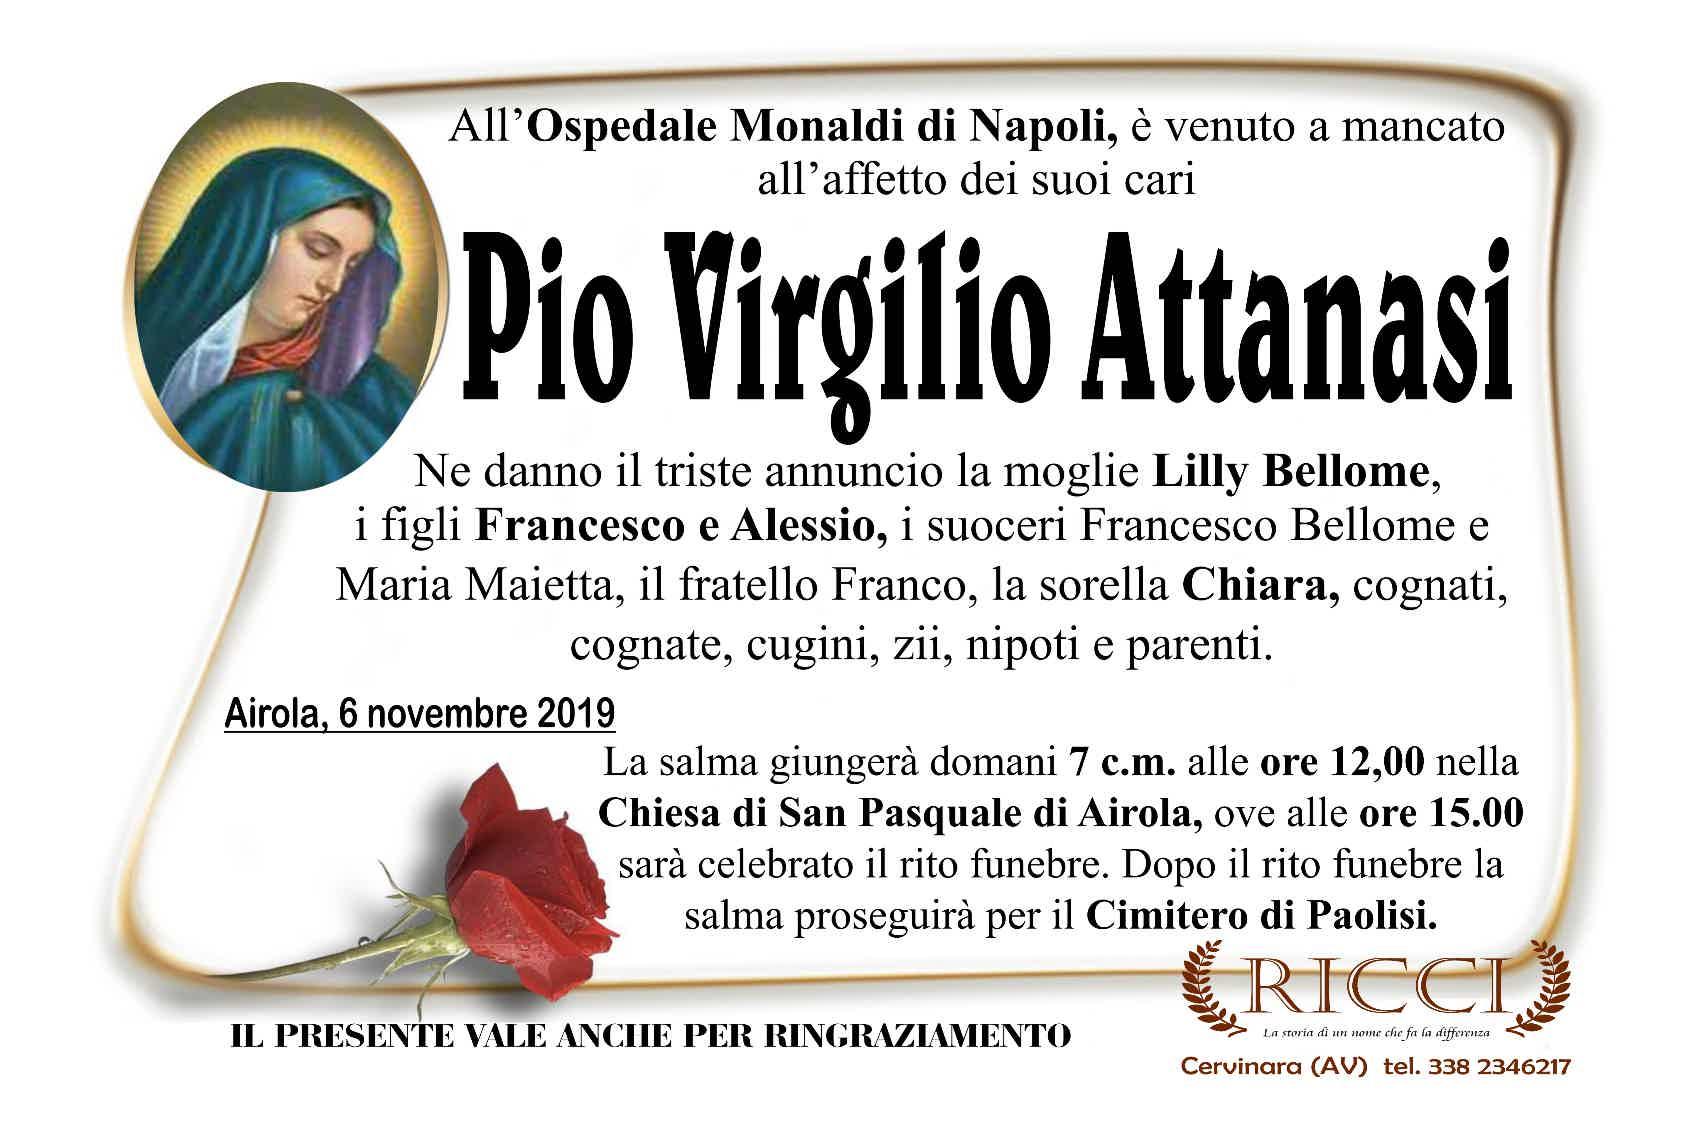 Pio Virgilio Attanasi